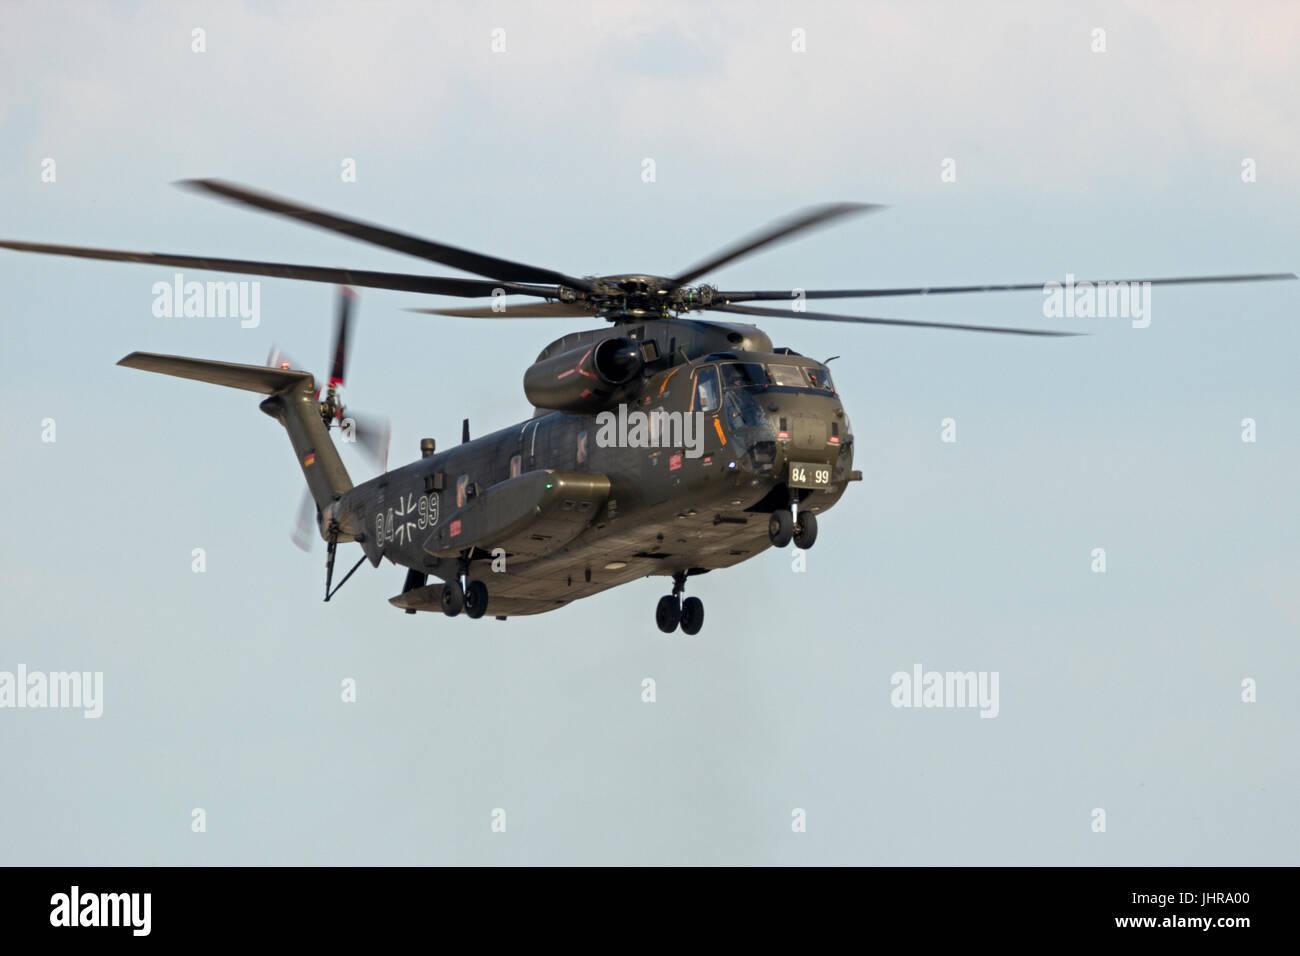 BERLIN - JUN 2, 2016: German Atrmy Sikorsky CH-53 Stallion heavy transport helicopter landing on Berlin-Schoneveld - Stock Image